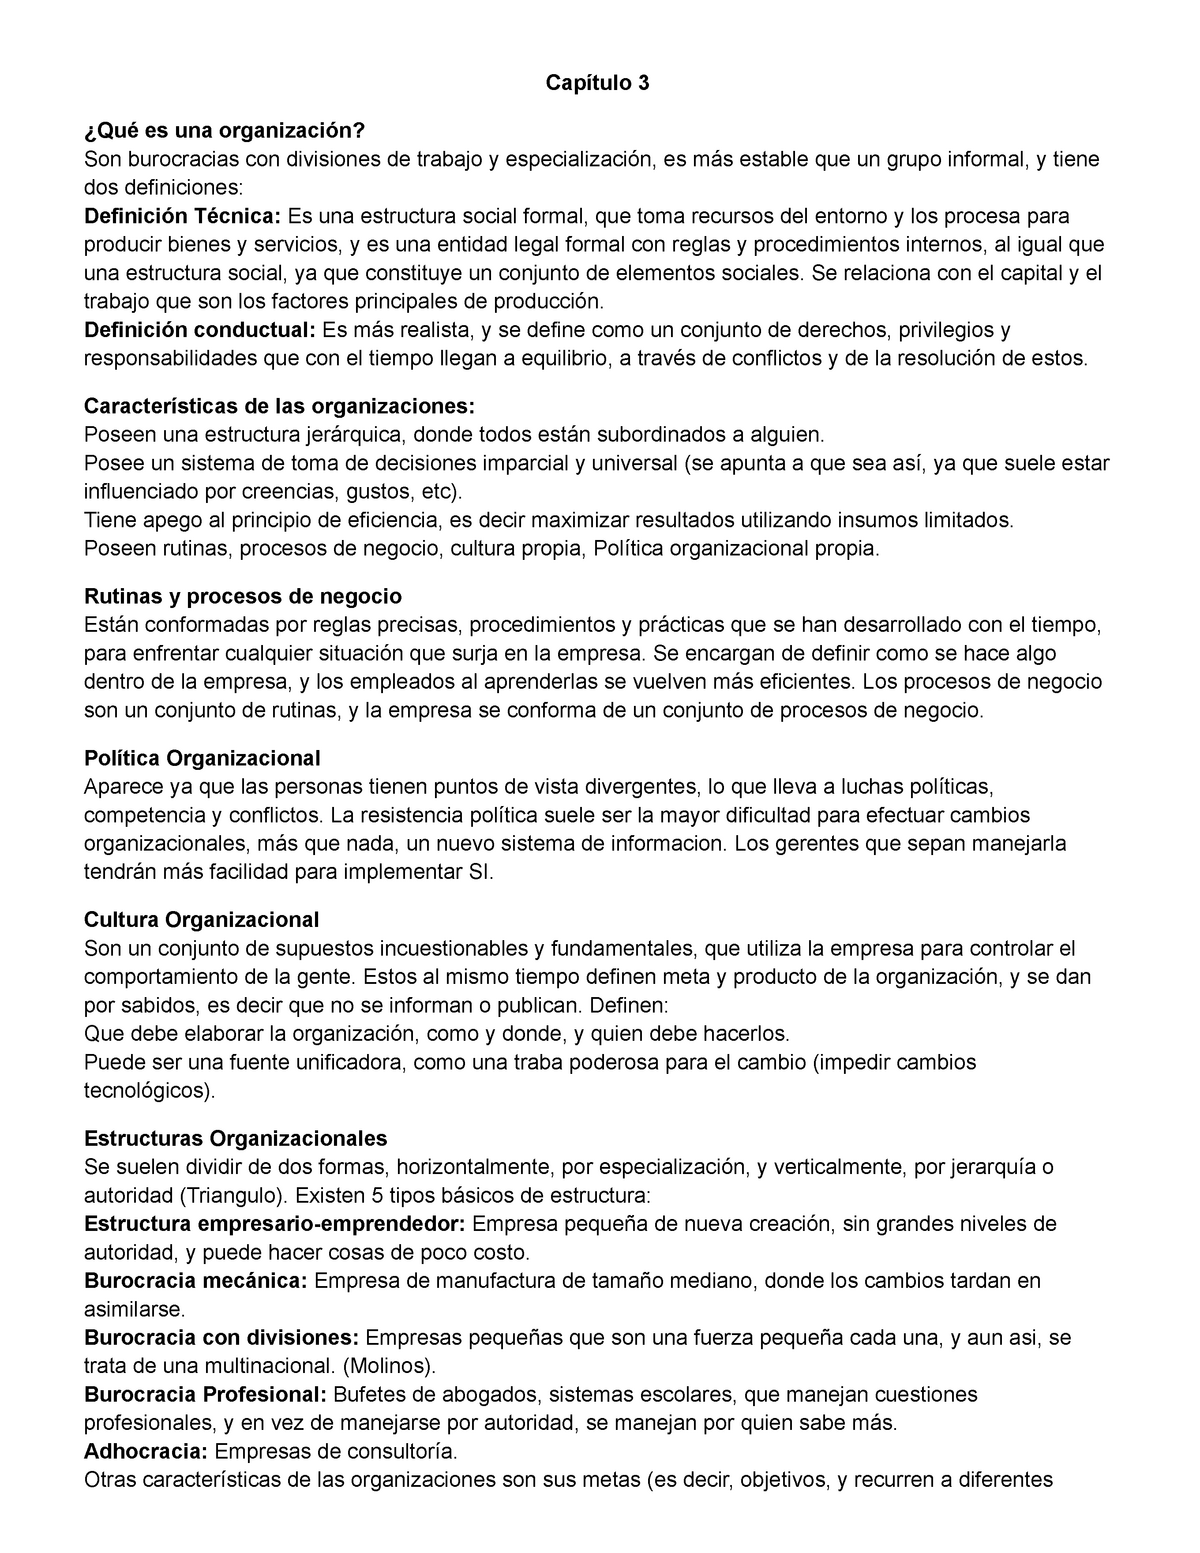 Capitulo 3 Cornaccia Resumen Management Information